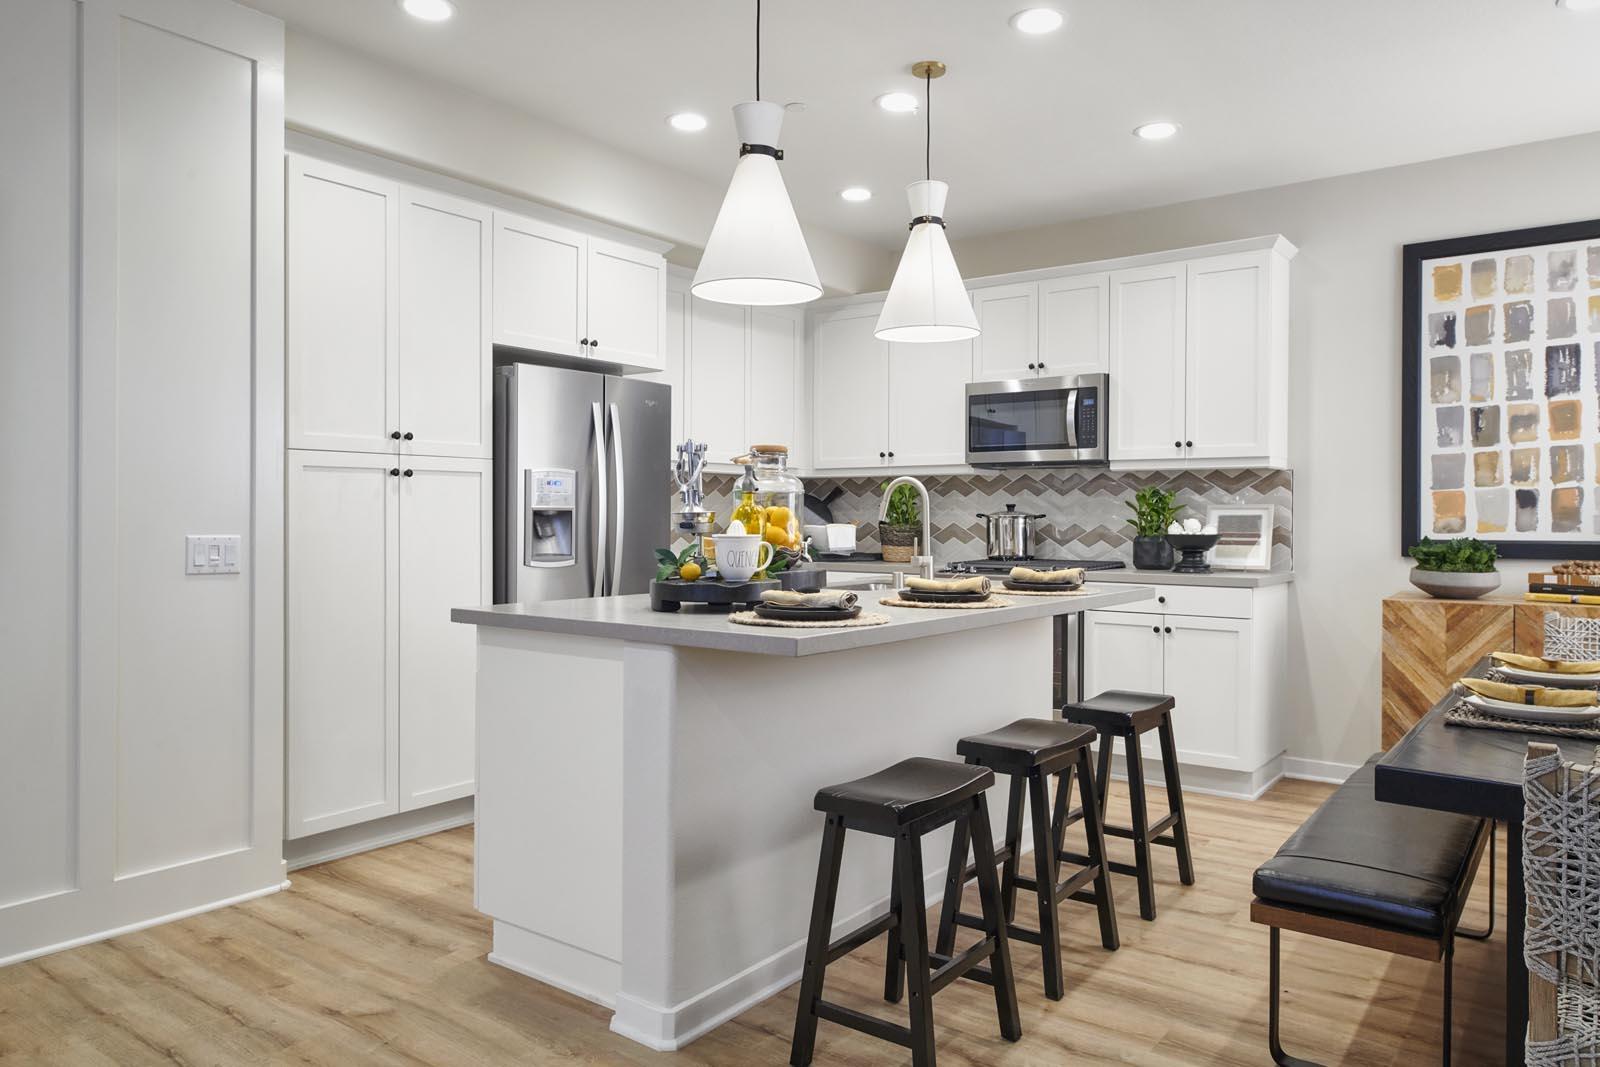 Kitchen | Residence 2 | Lumin | New Homes in Rancho Cucamonga, CA | Van Daele Homes